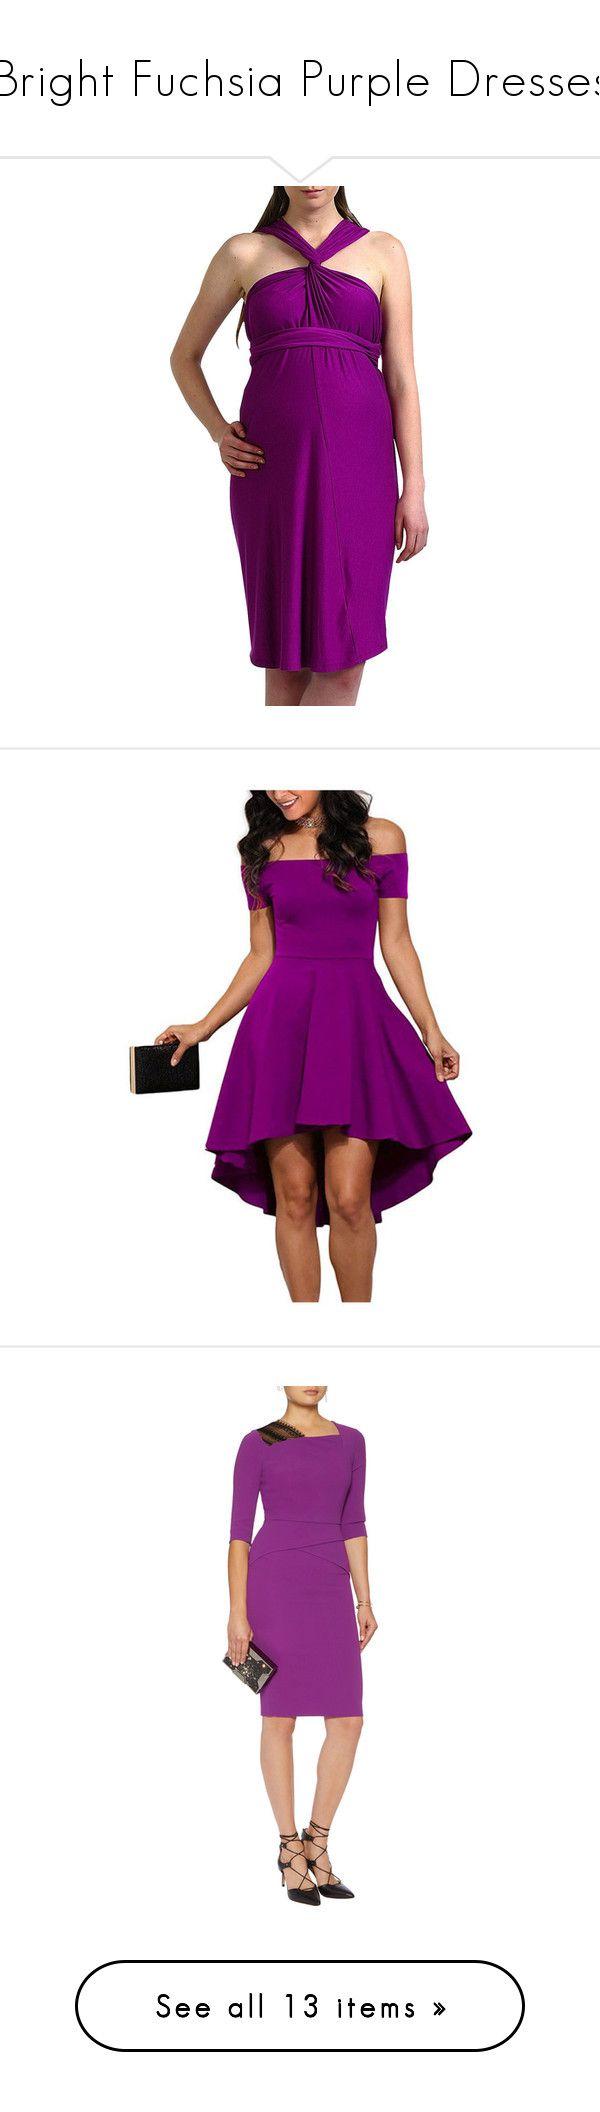 """Bright Fuchsia Purple Dresses"" by tegan-b-riley on Polyvore featuring plus size, dresses, purple, sleeved dresses, purple dresses, purple off the shoulder dress, hi low dress, hi lo dress, roland mouret dress and crepe dress"